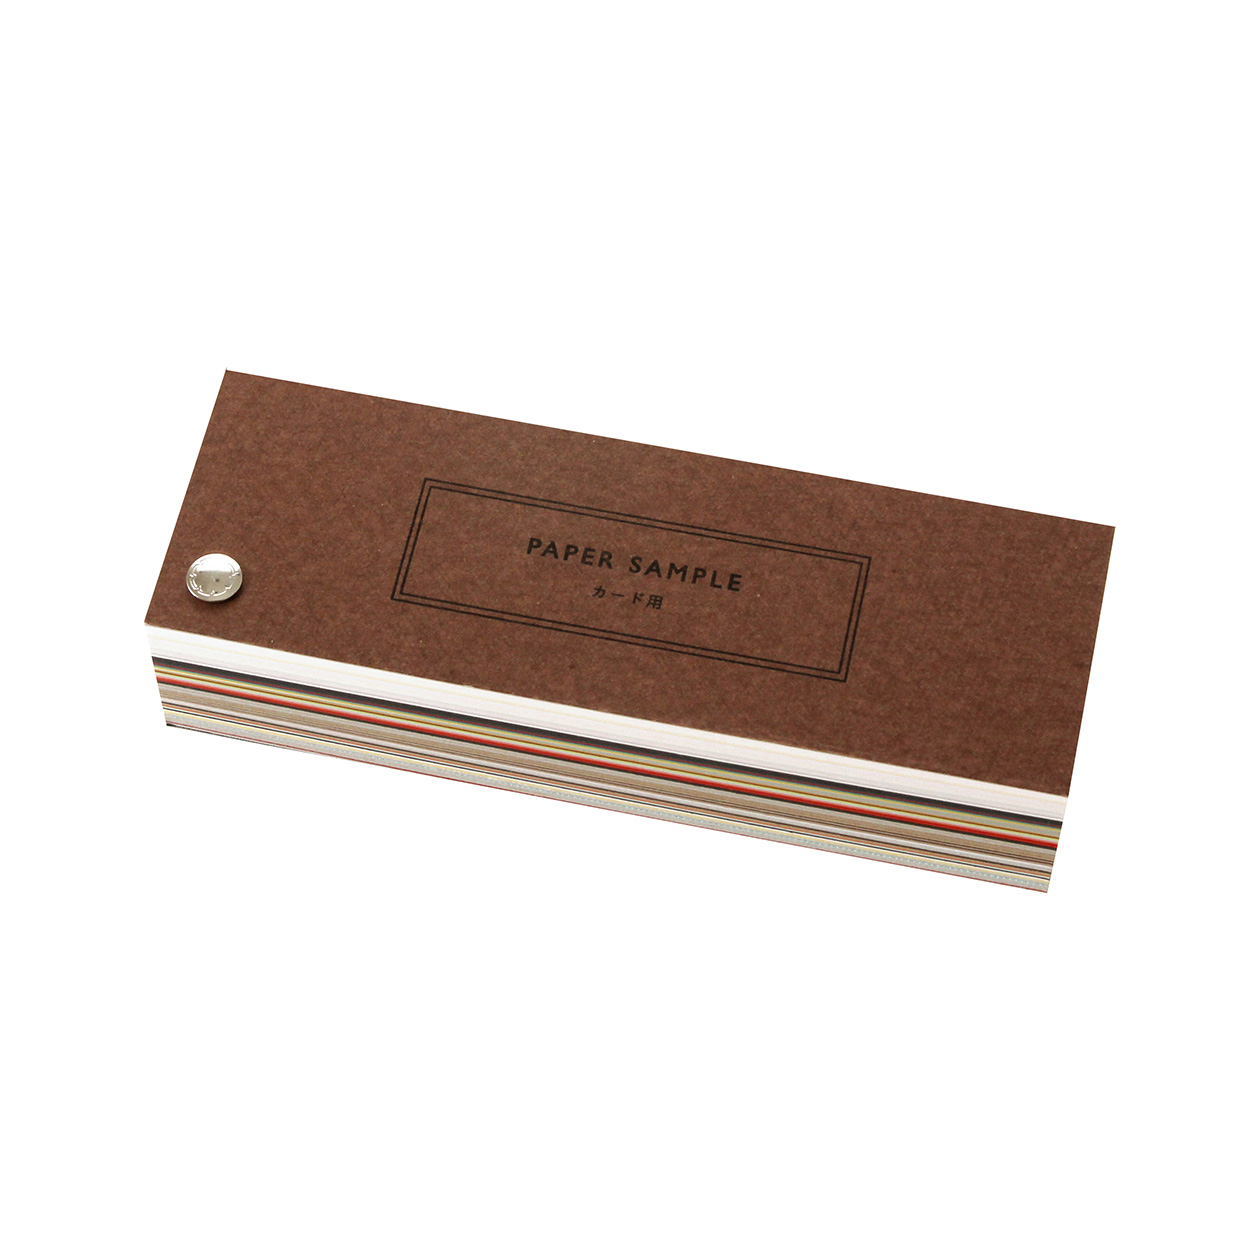 PAPER SAMPLE(カード用)